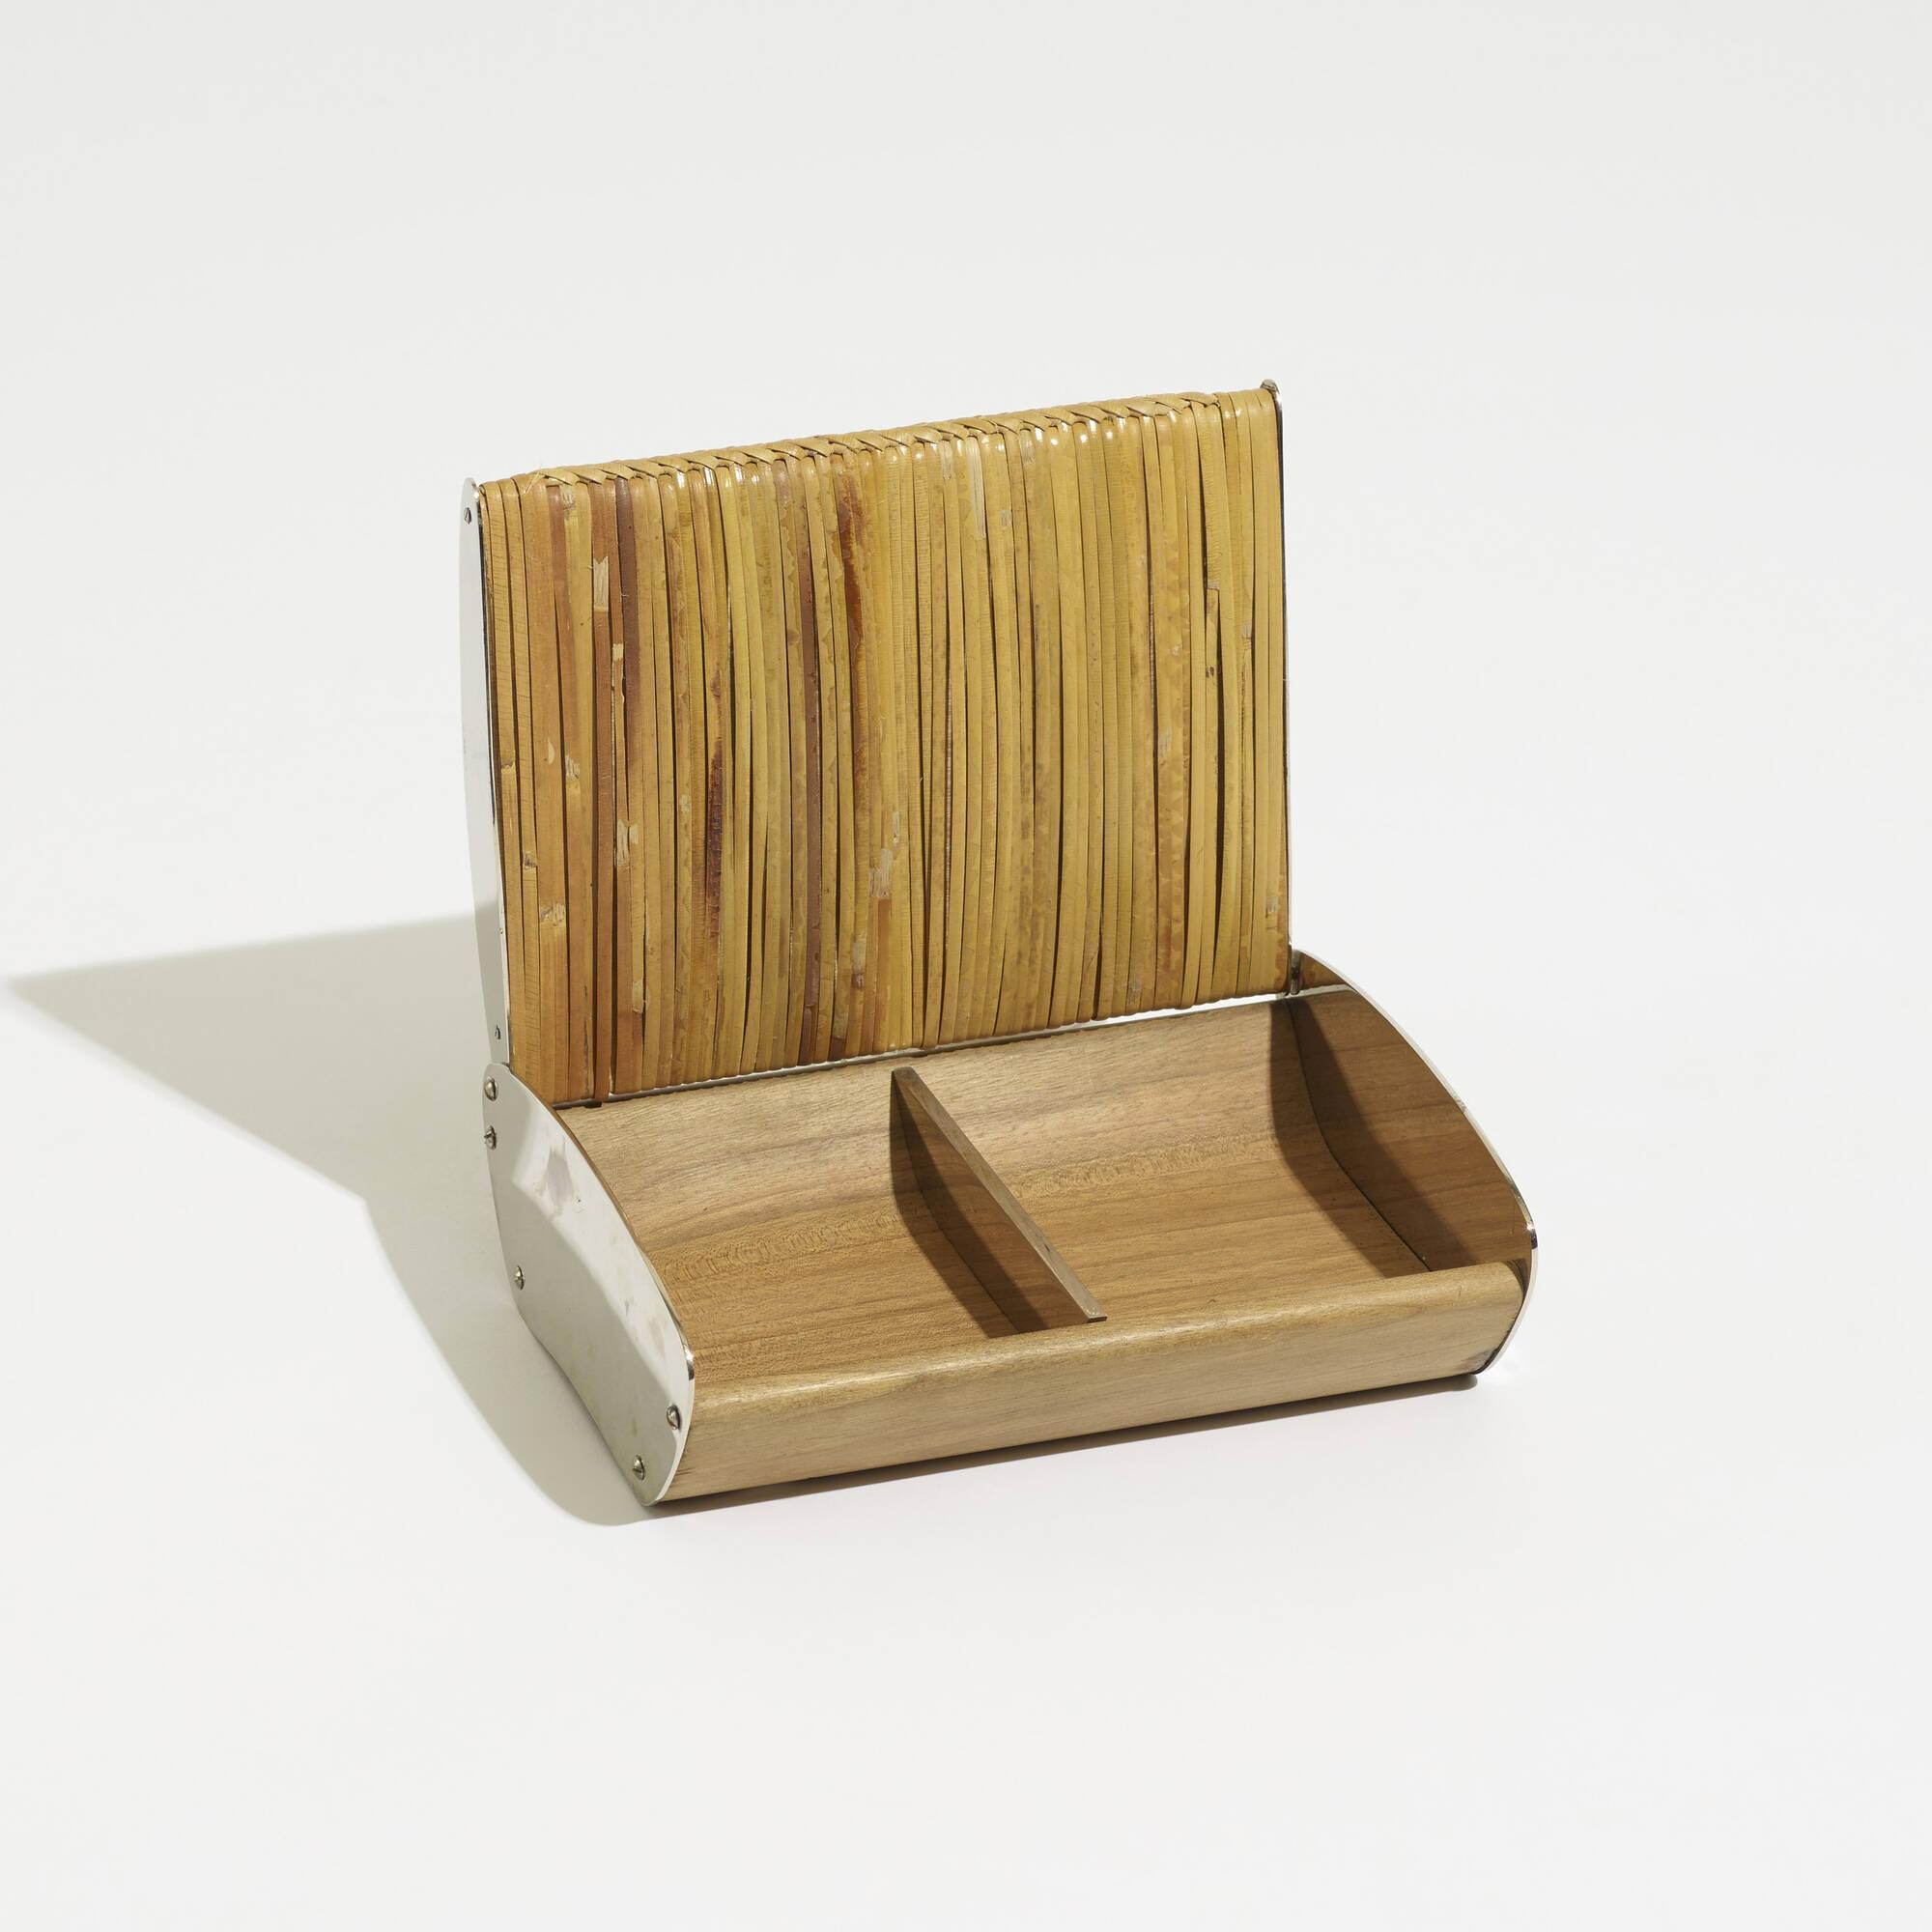 168: Carl Auböck II / rare box, model 3656 (3 of 3)